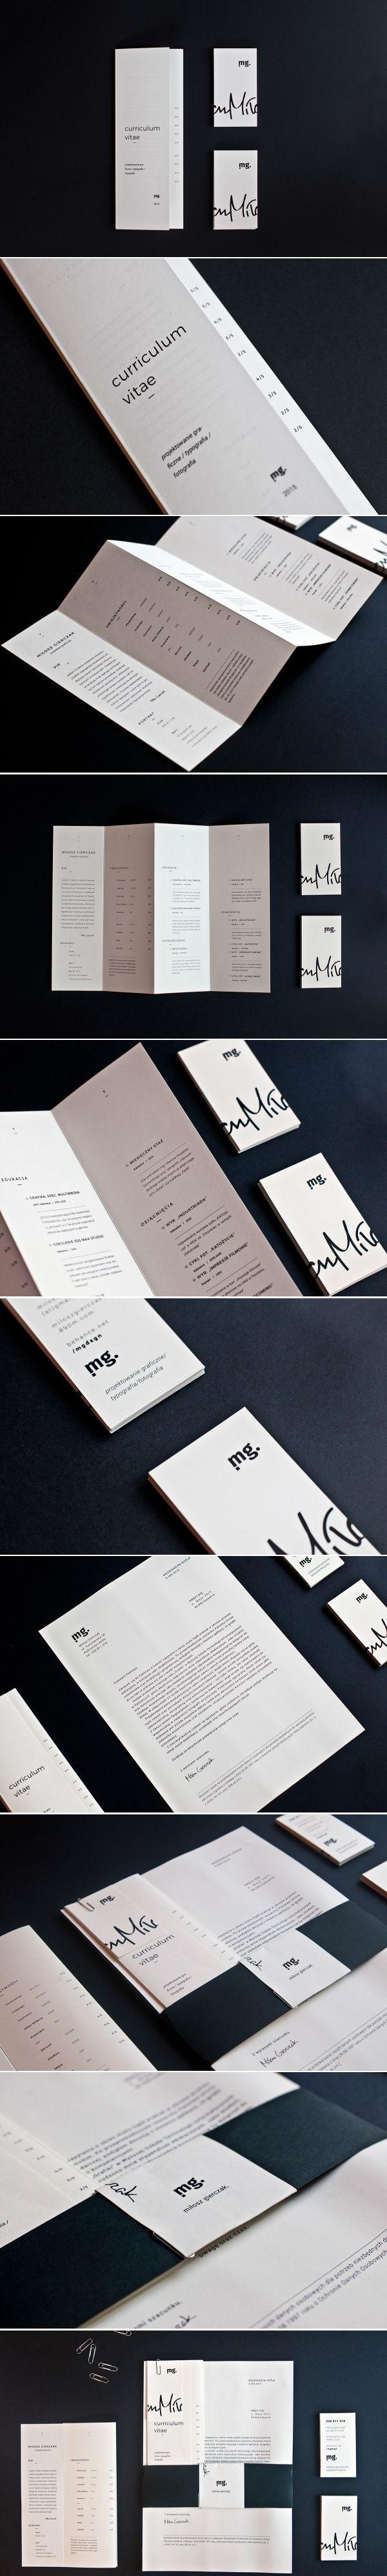 cv folder  mailer  - quad u0026 39 fold brochure